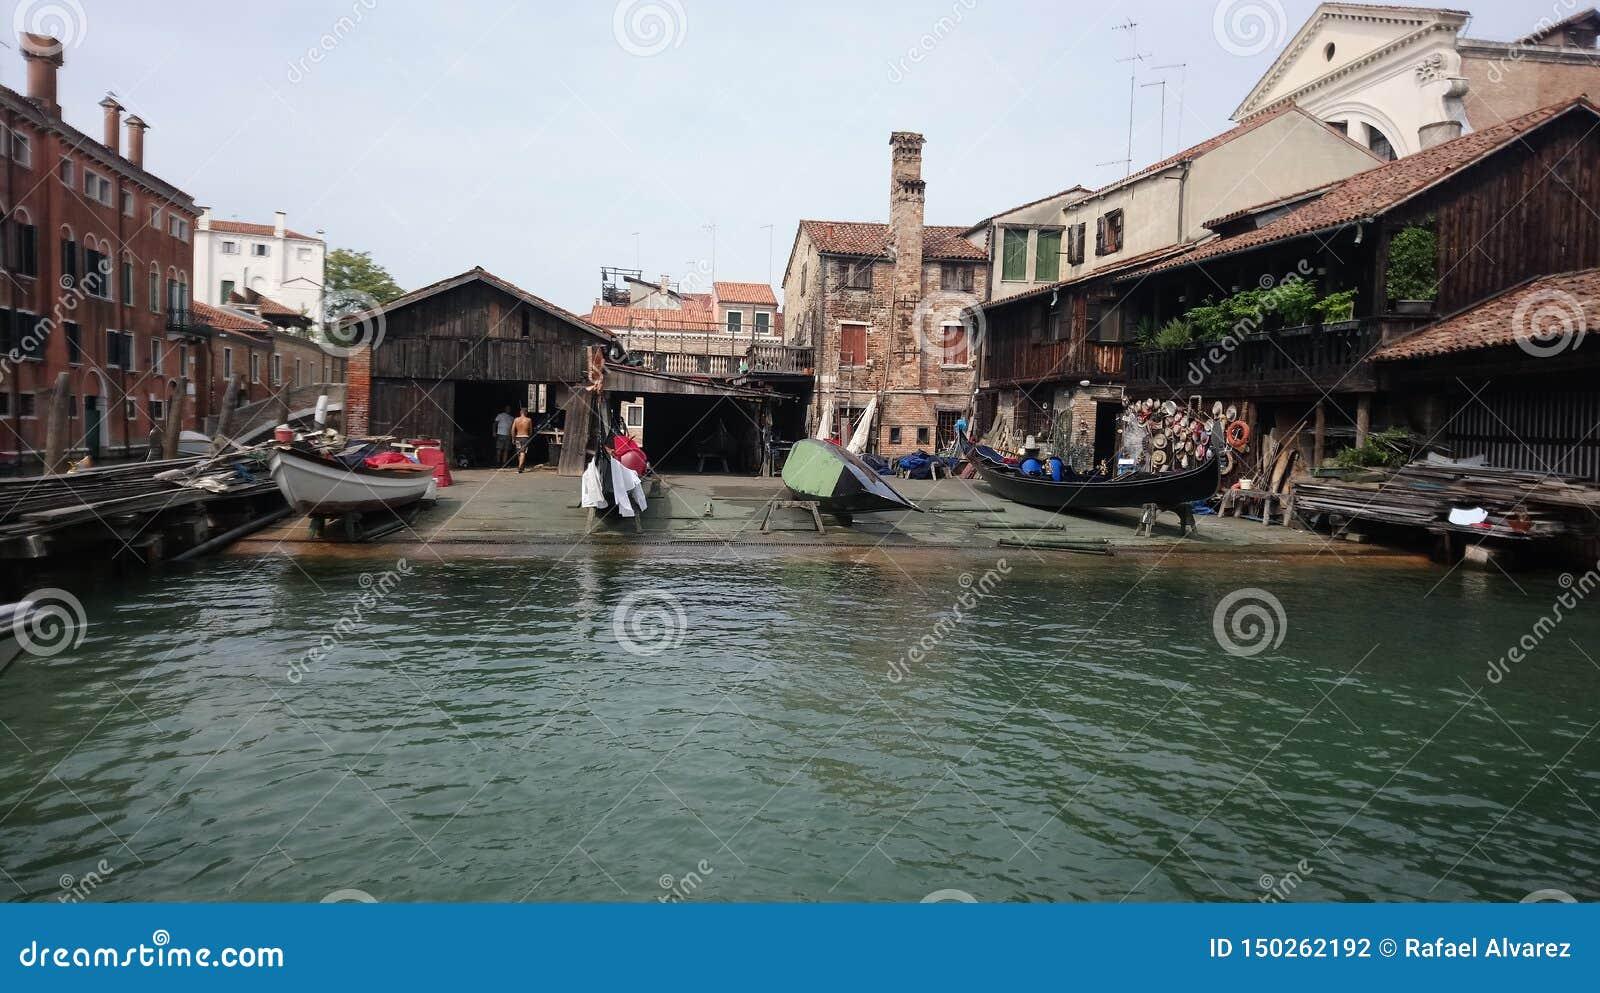 Venice on September